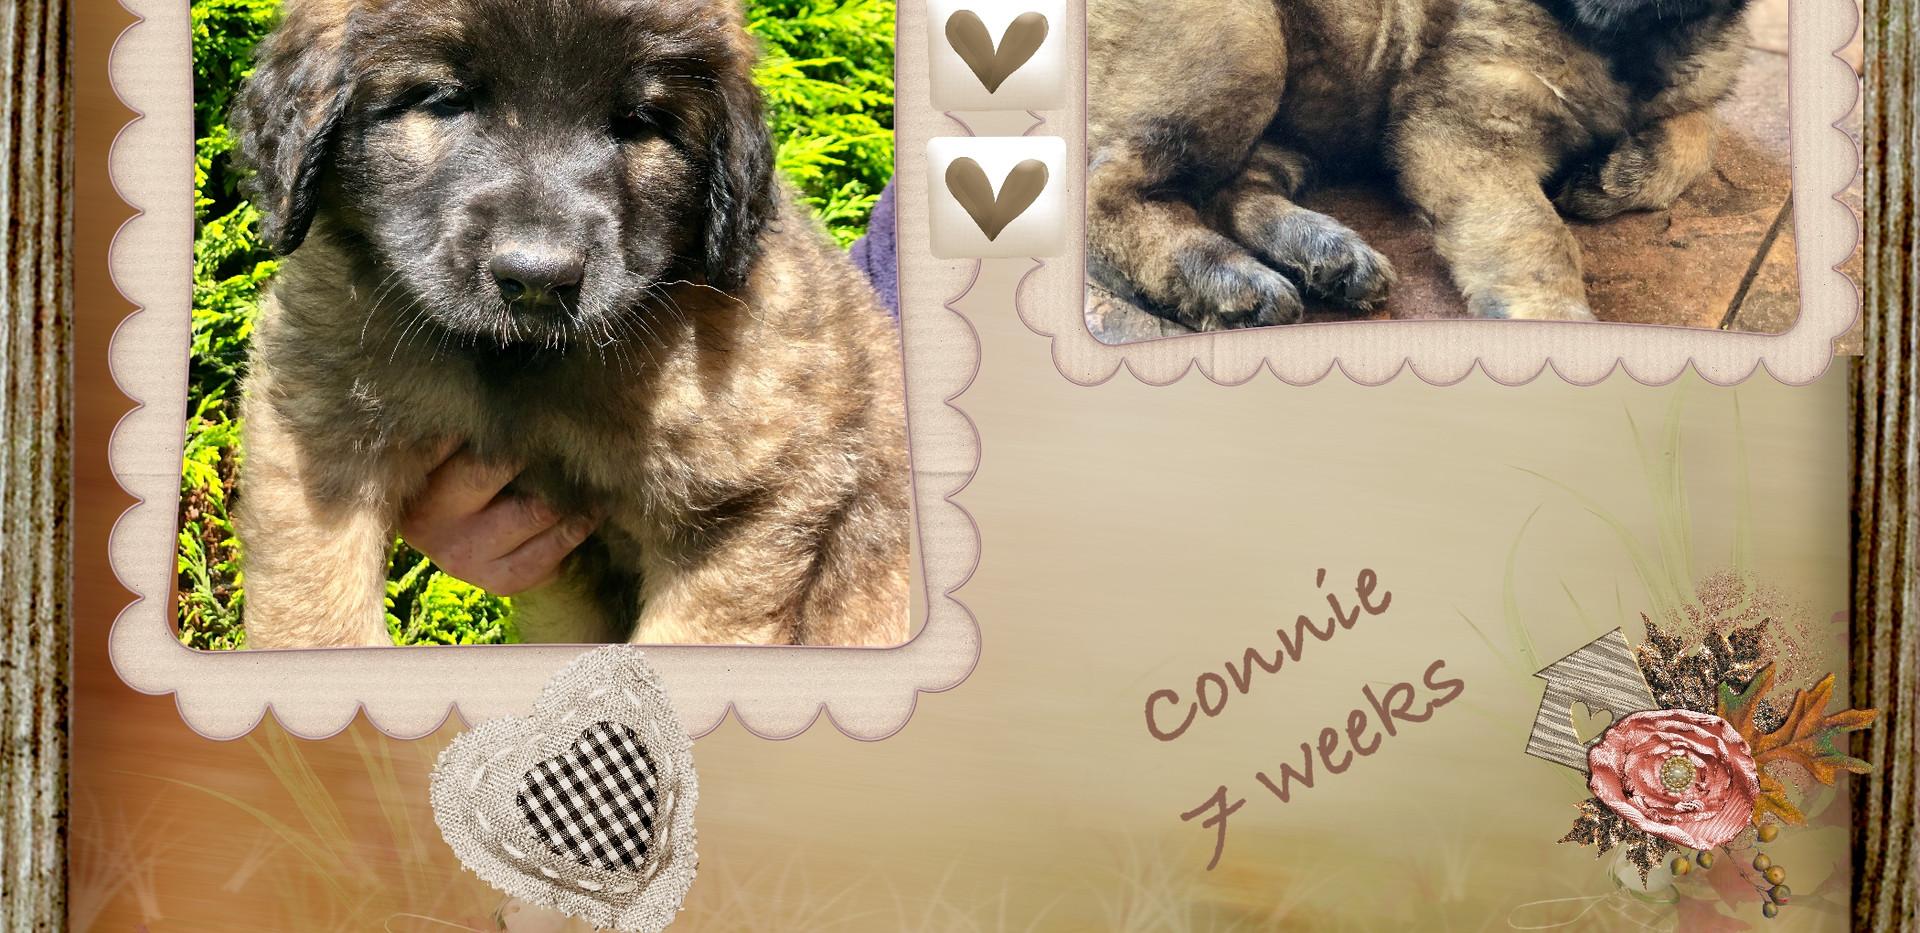 3. Connie